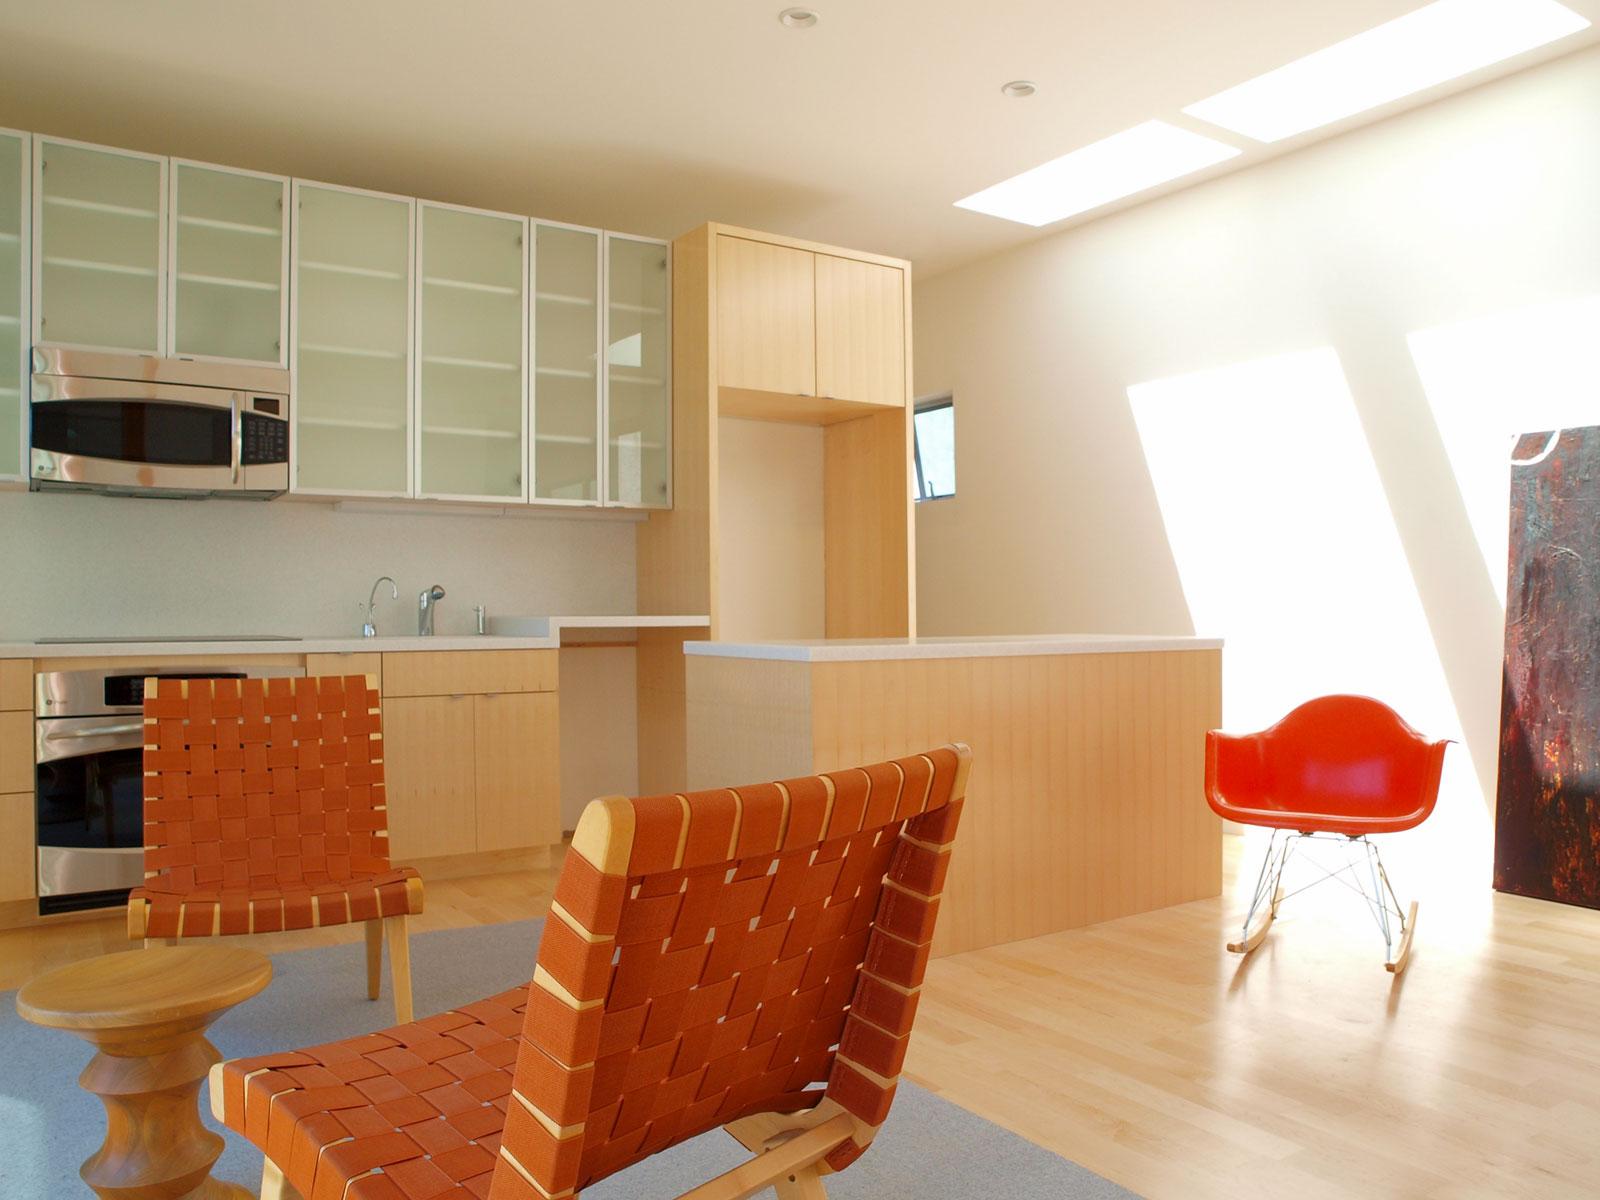 davis studio pieceHomes guest house modular home